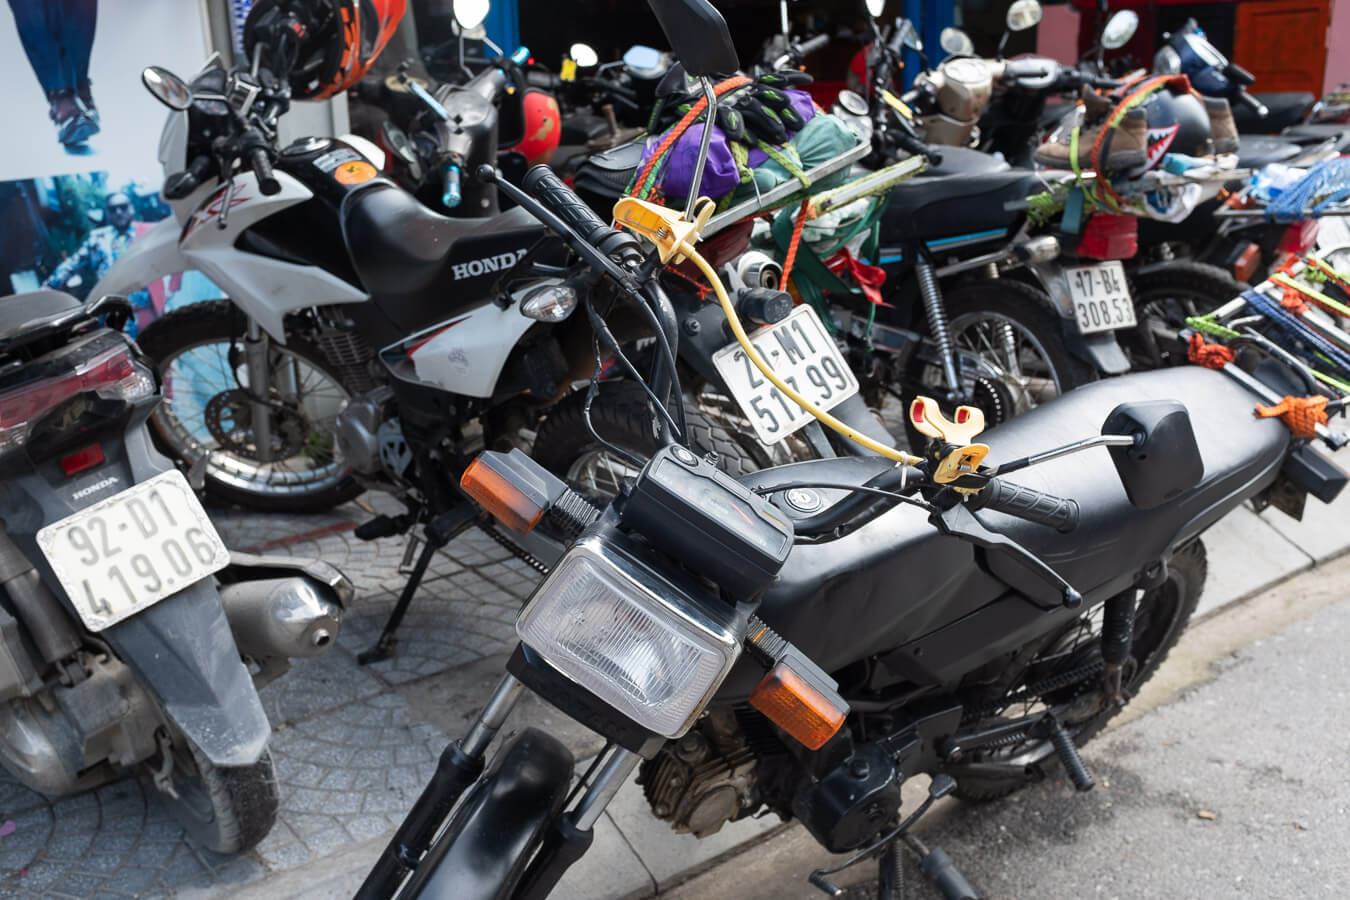 Types of motorbikes: Vietnam motorbike rental